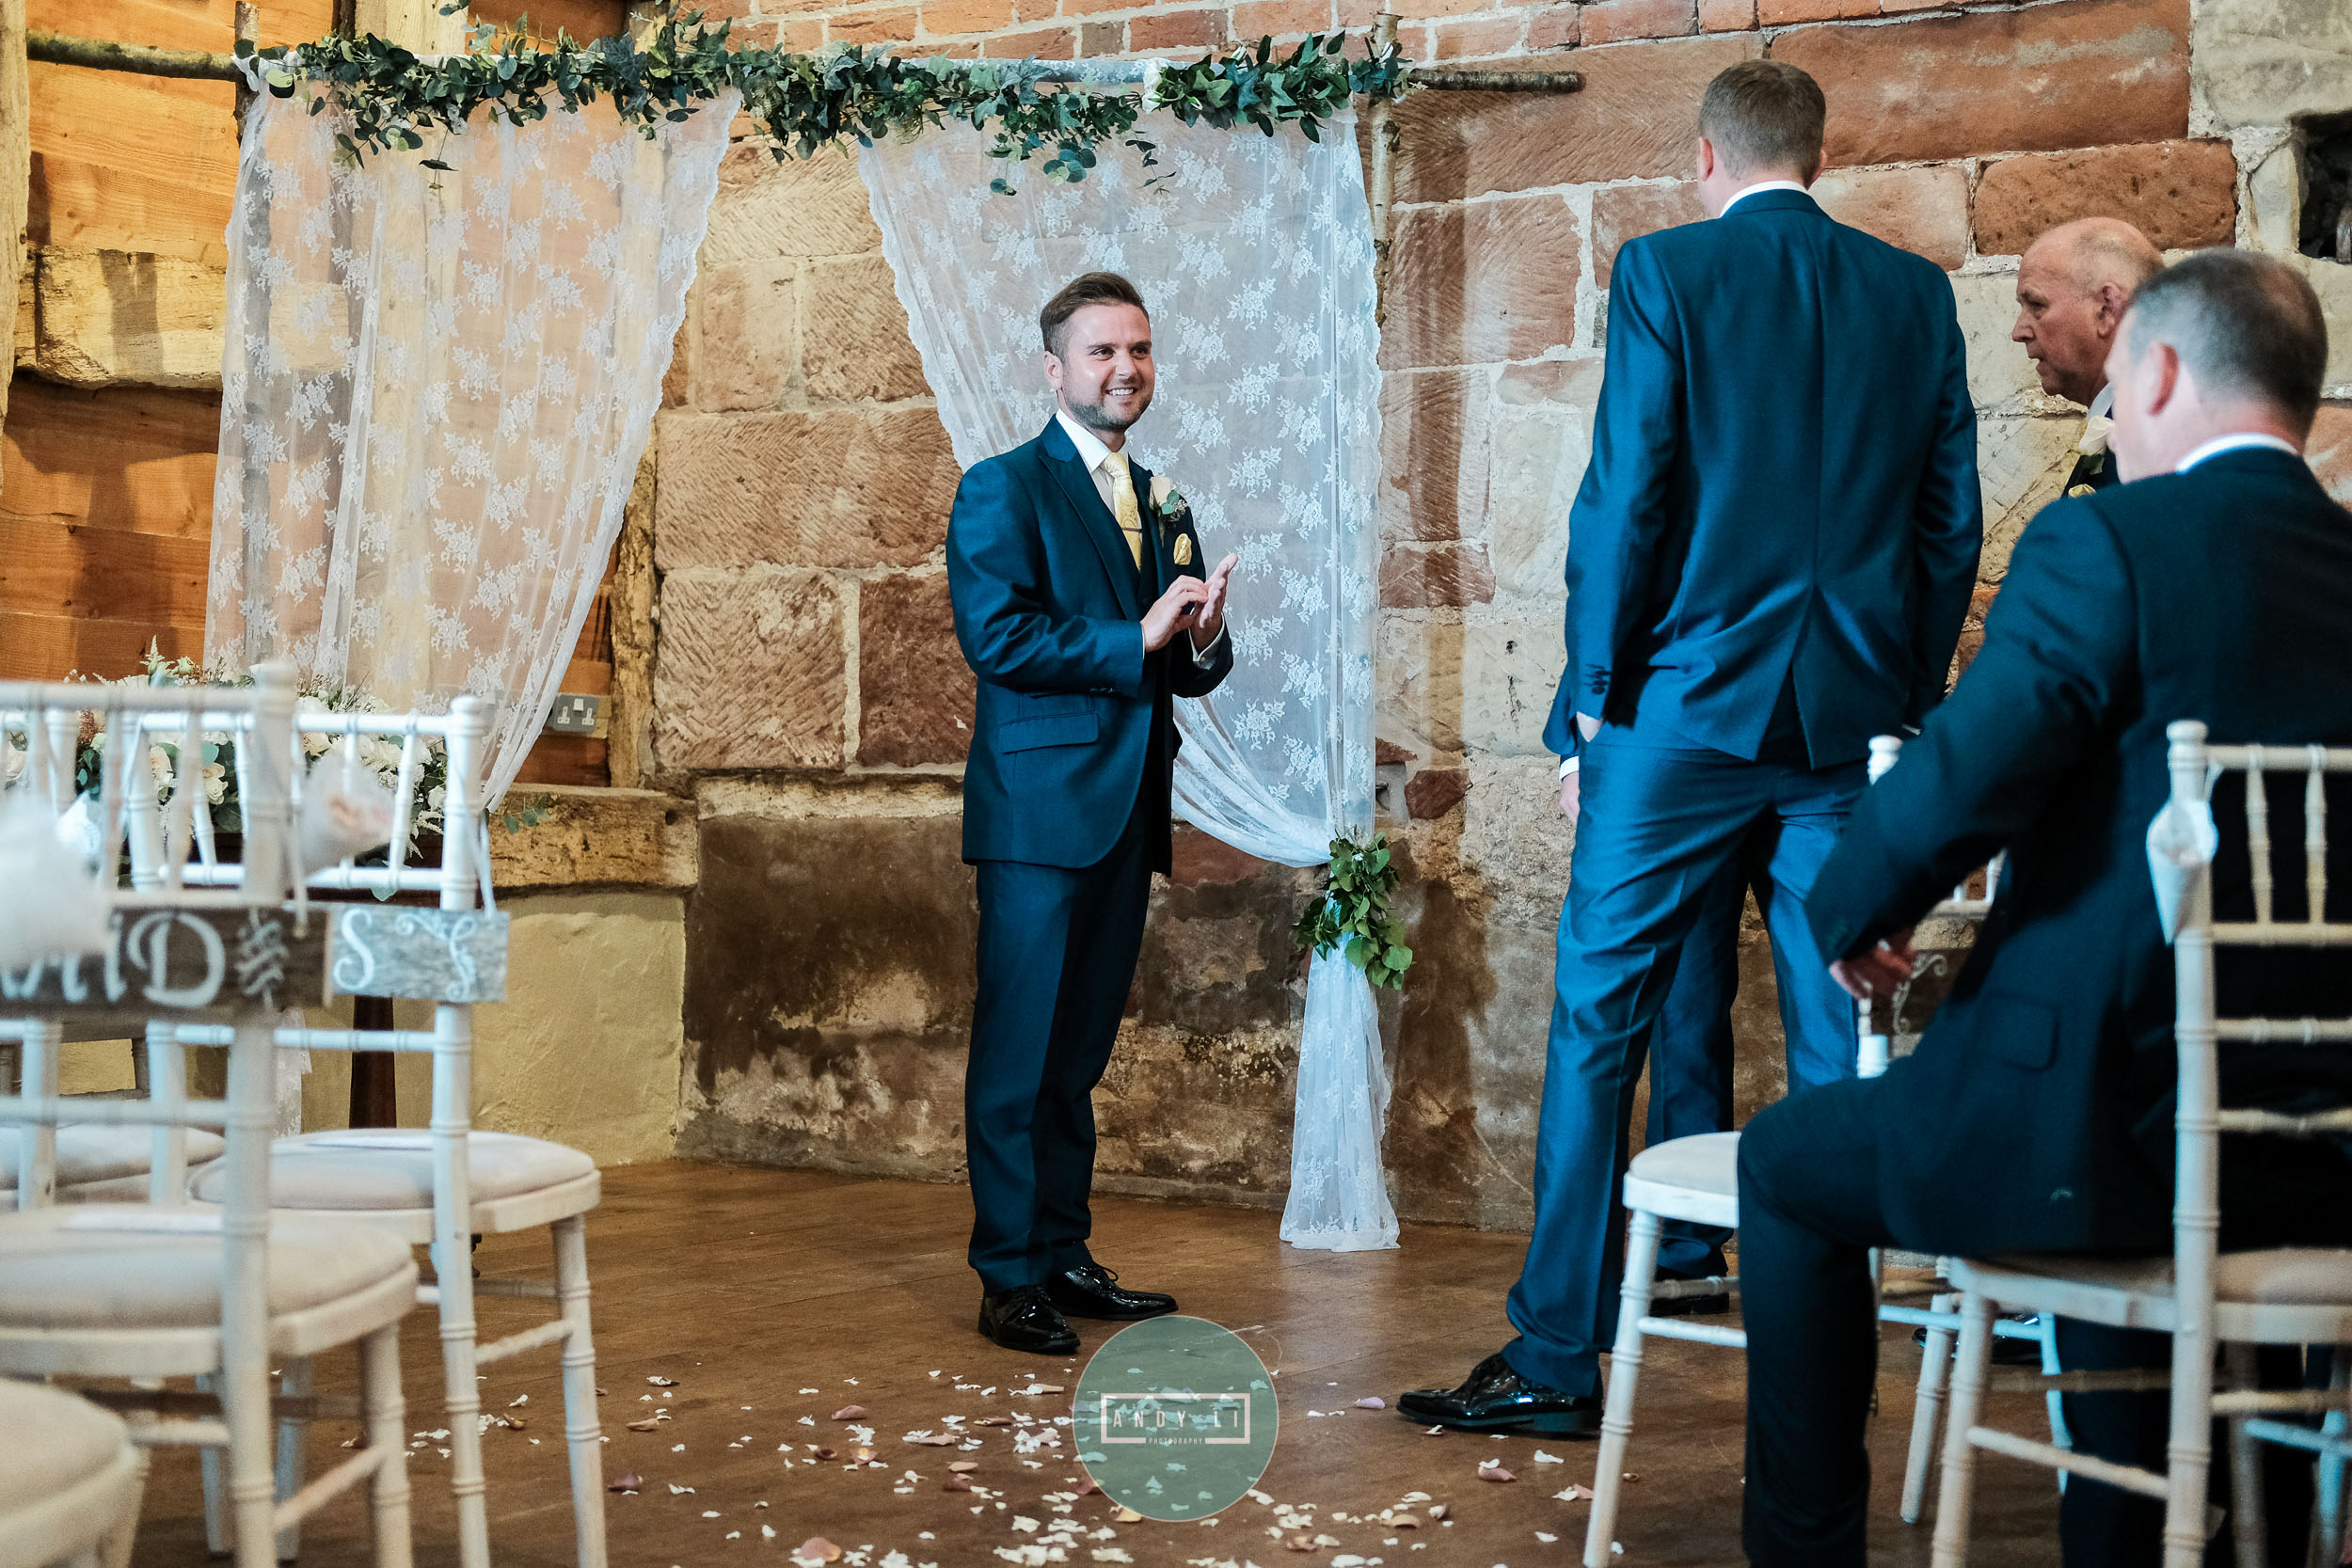 Pimhill Barn Wedding Photographer-047-DSCF0027.jpg